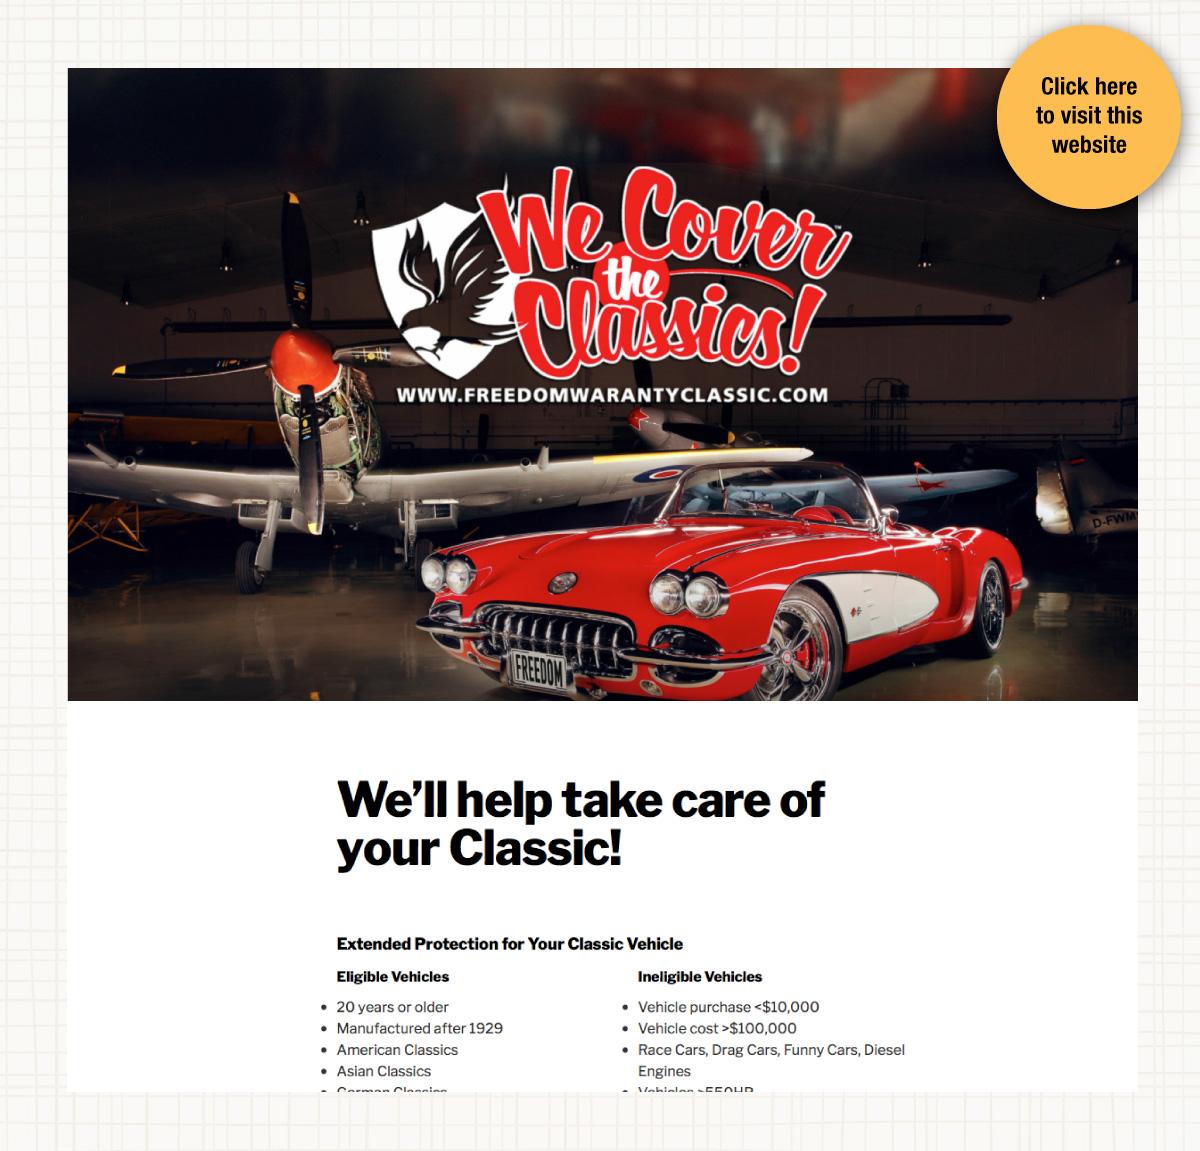 Website for Freedom Warranty Classic